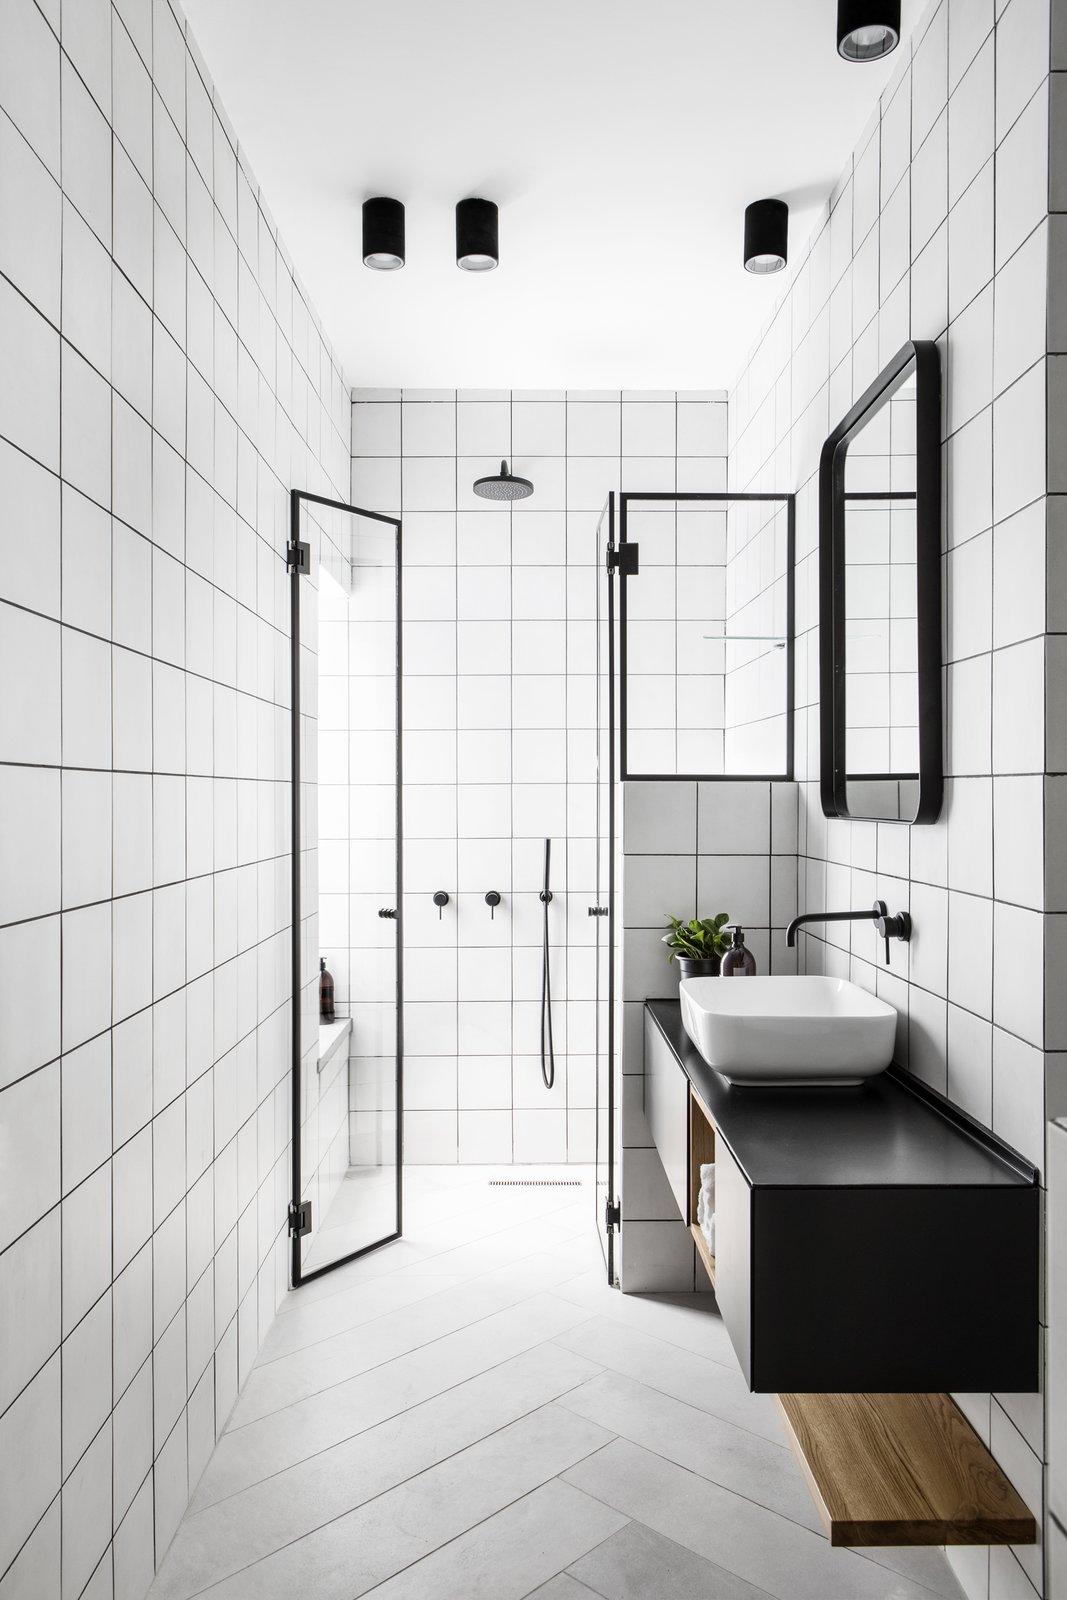 Bath Room Geometric monochrome bathroom.  Nir Am House by Shir Shtaigman